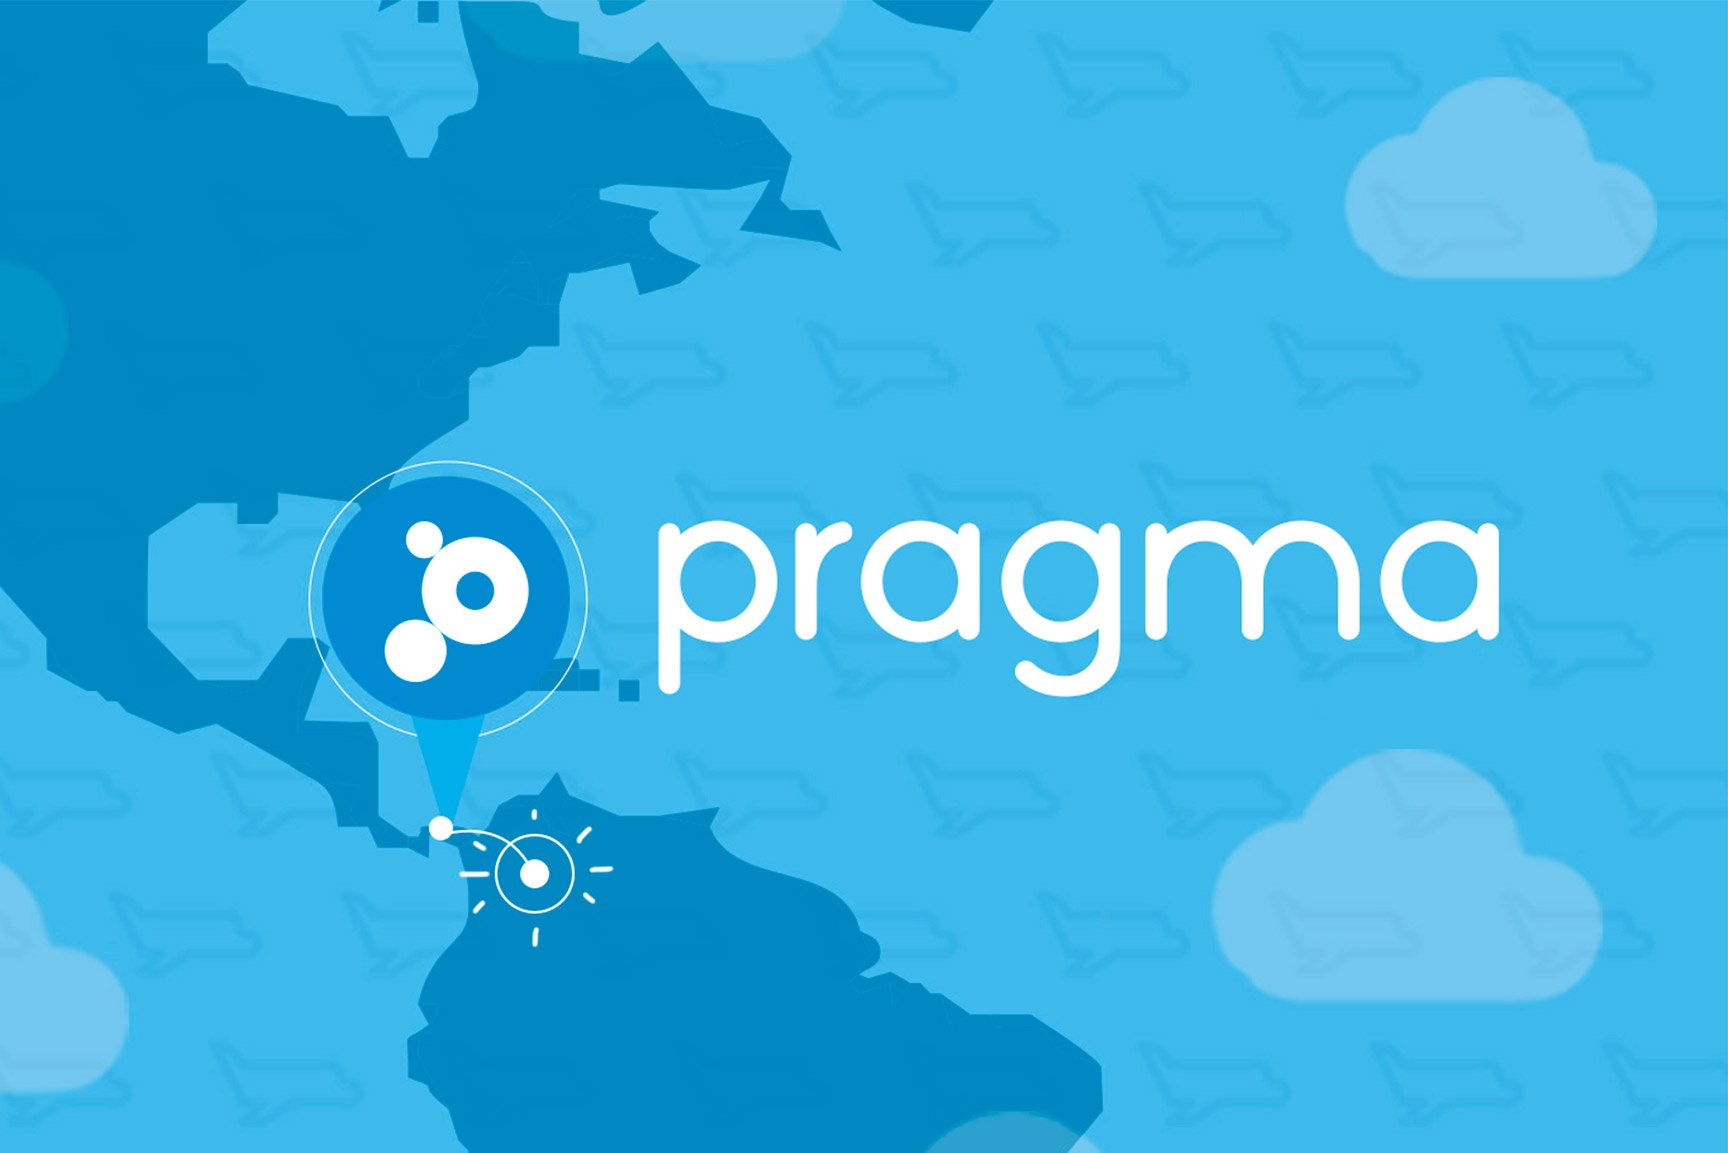 h_pragma_s_a_esta_ejecutando_un_proceso_de_internacionalizacion